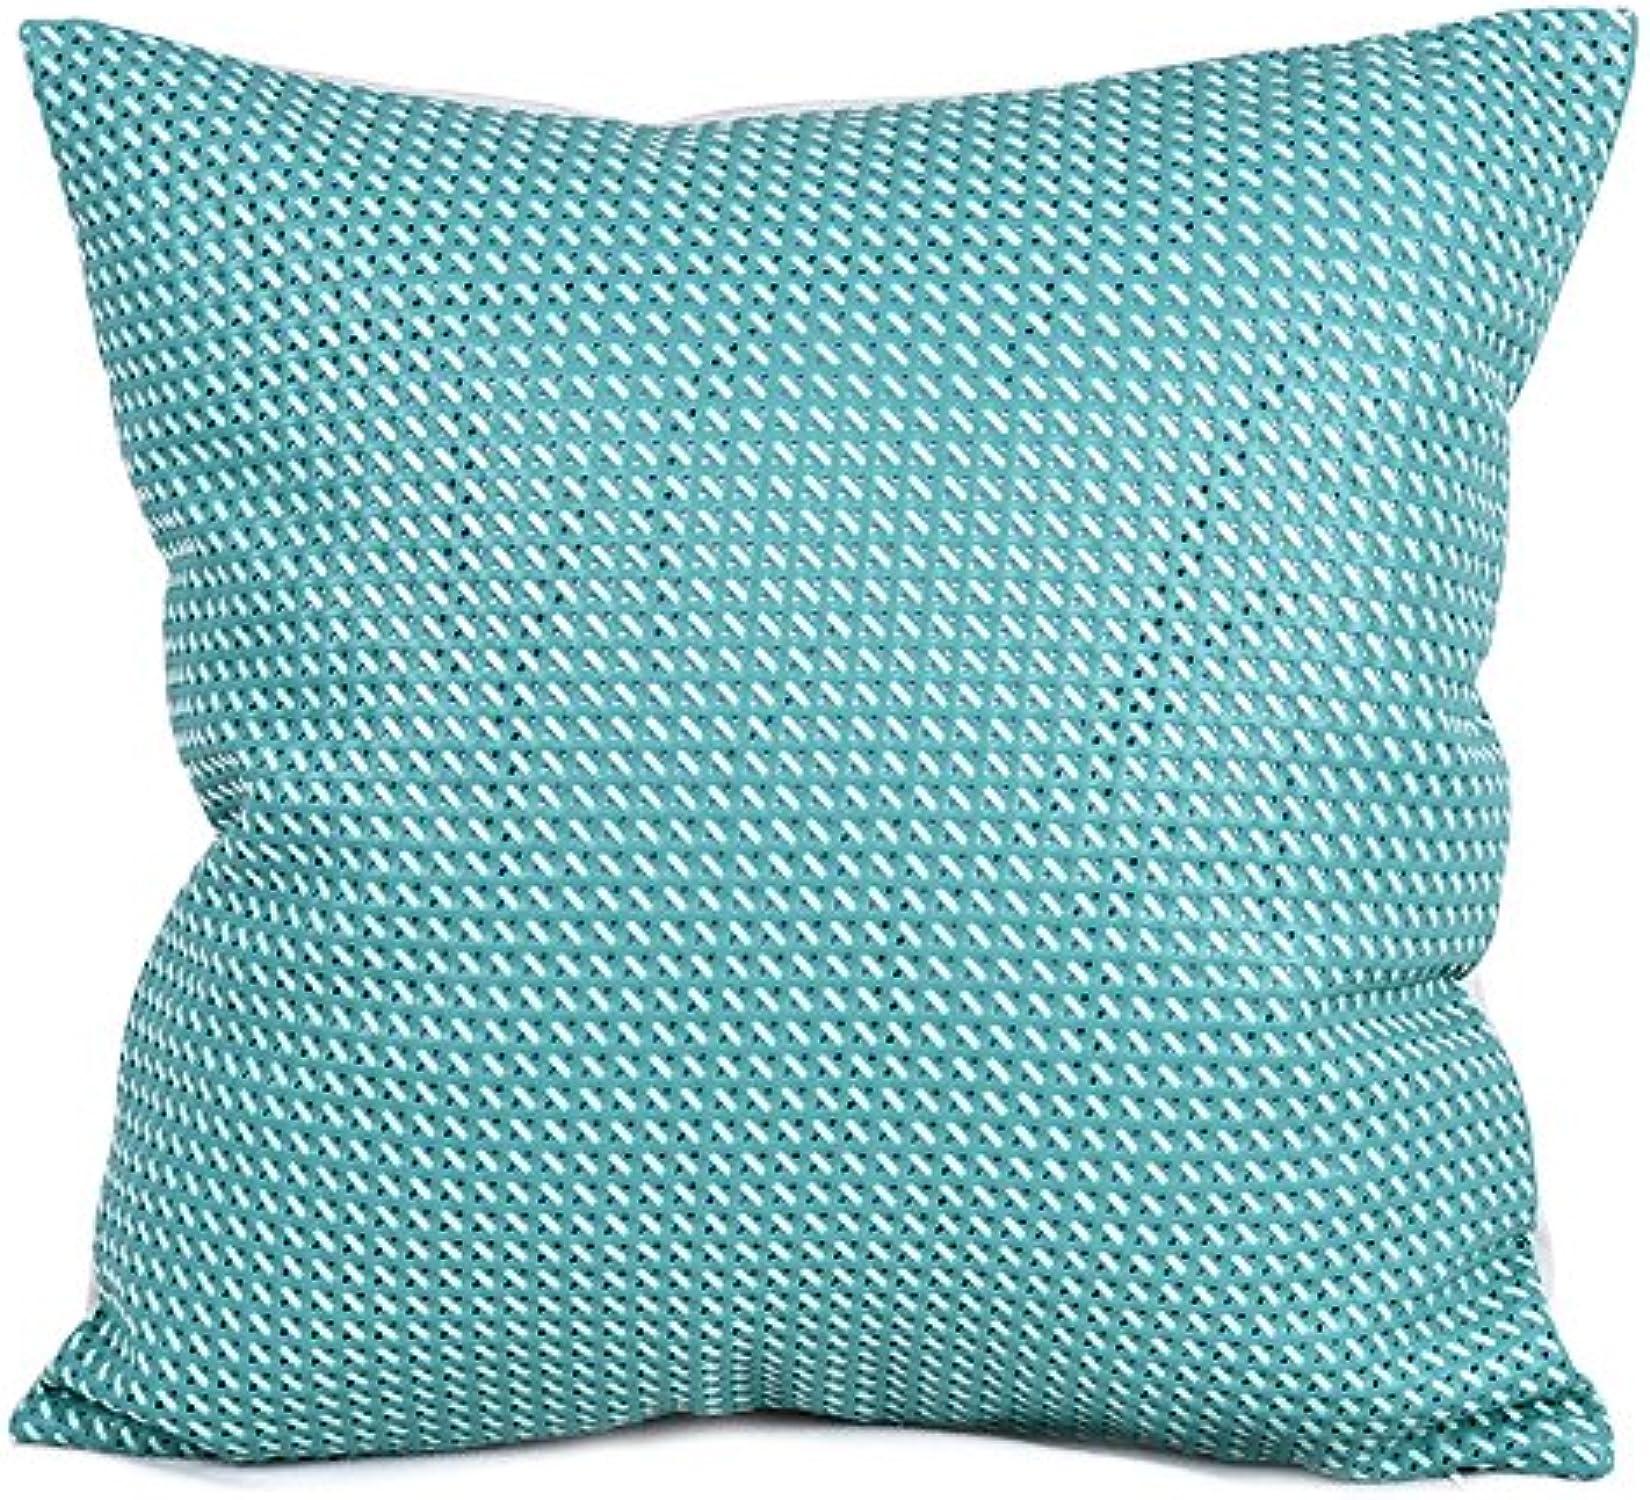 Vaevanhome Coussin en Cuir Bleu Et Vert Simple Moderne